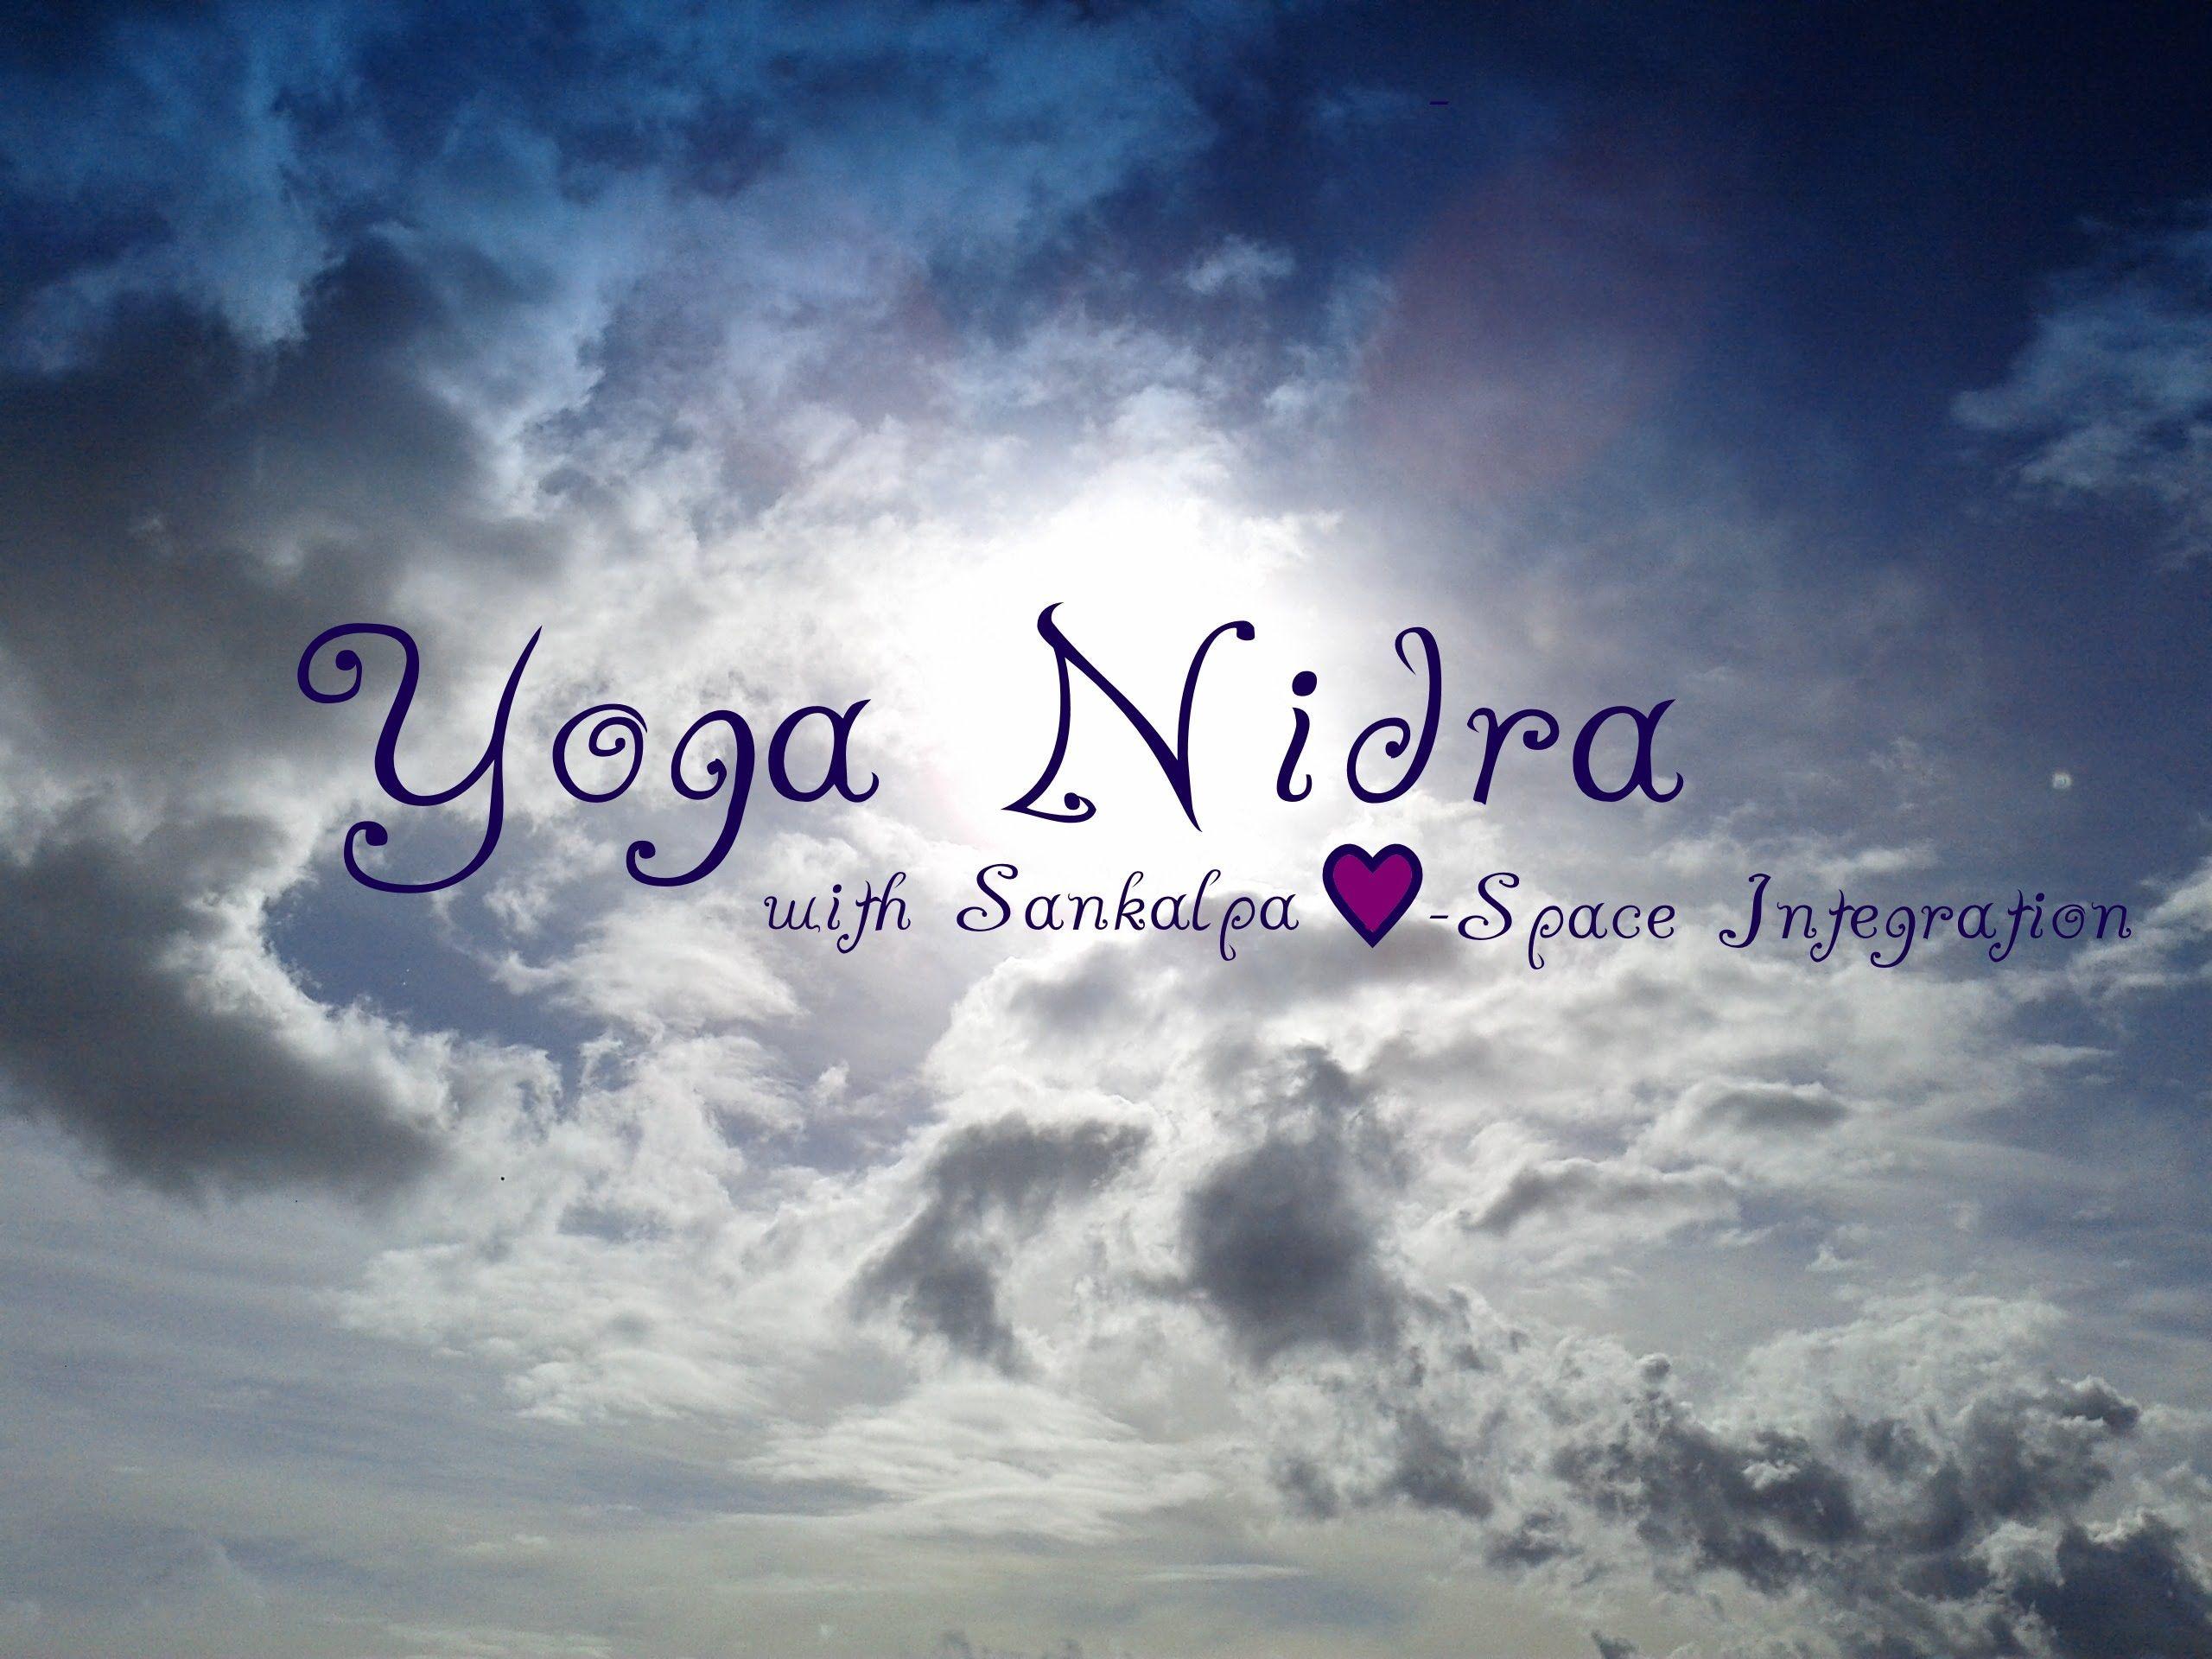 Yoga Nidra A 40 Minute Practice With Sankalpa Heart Space Integration Yoga Nidra Meditation Yoga Nidra Restorative Yoga